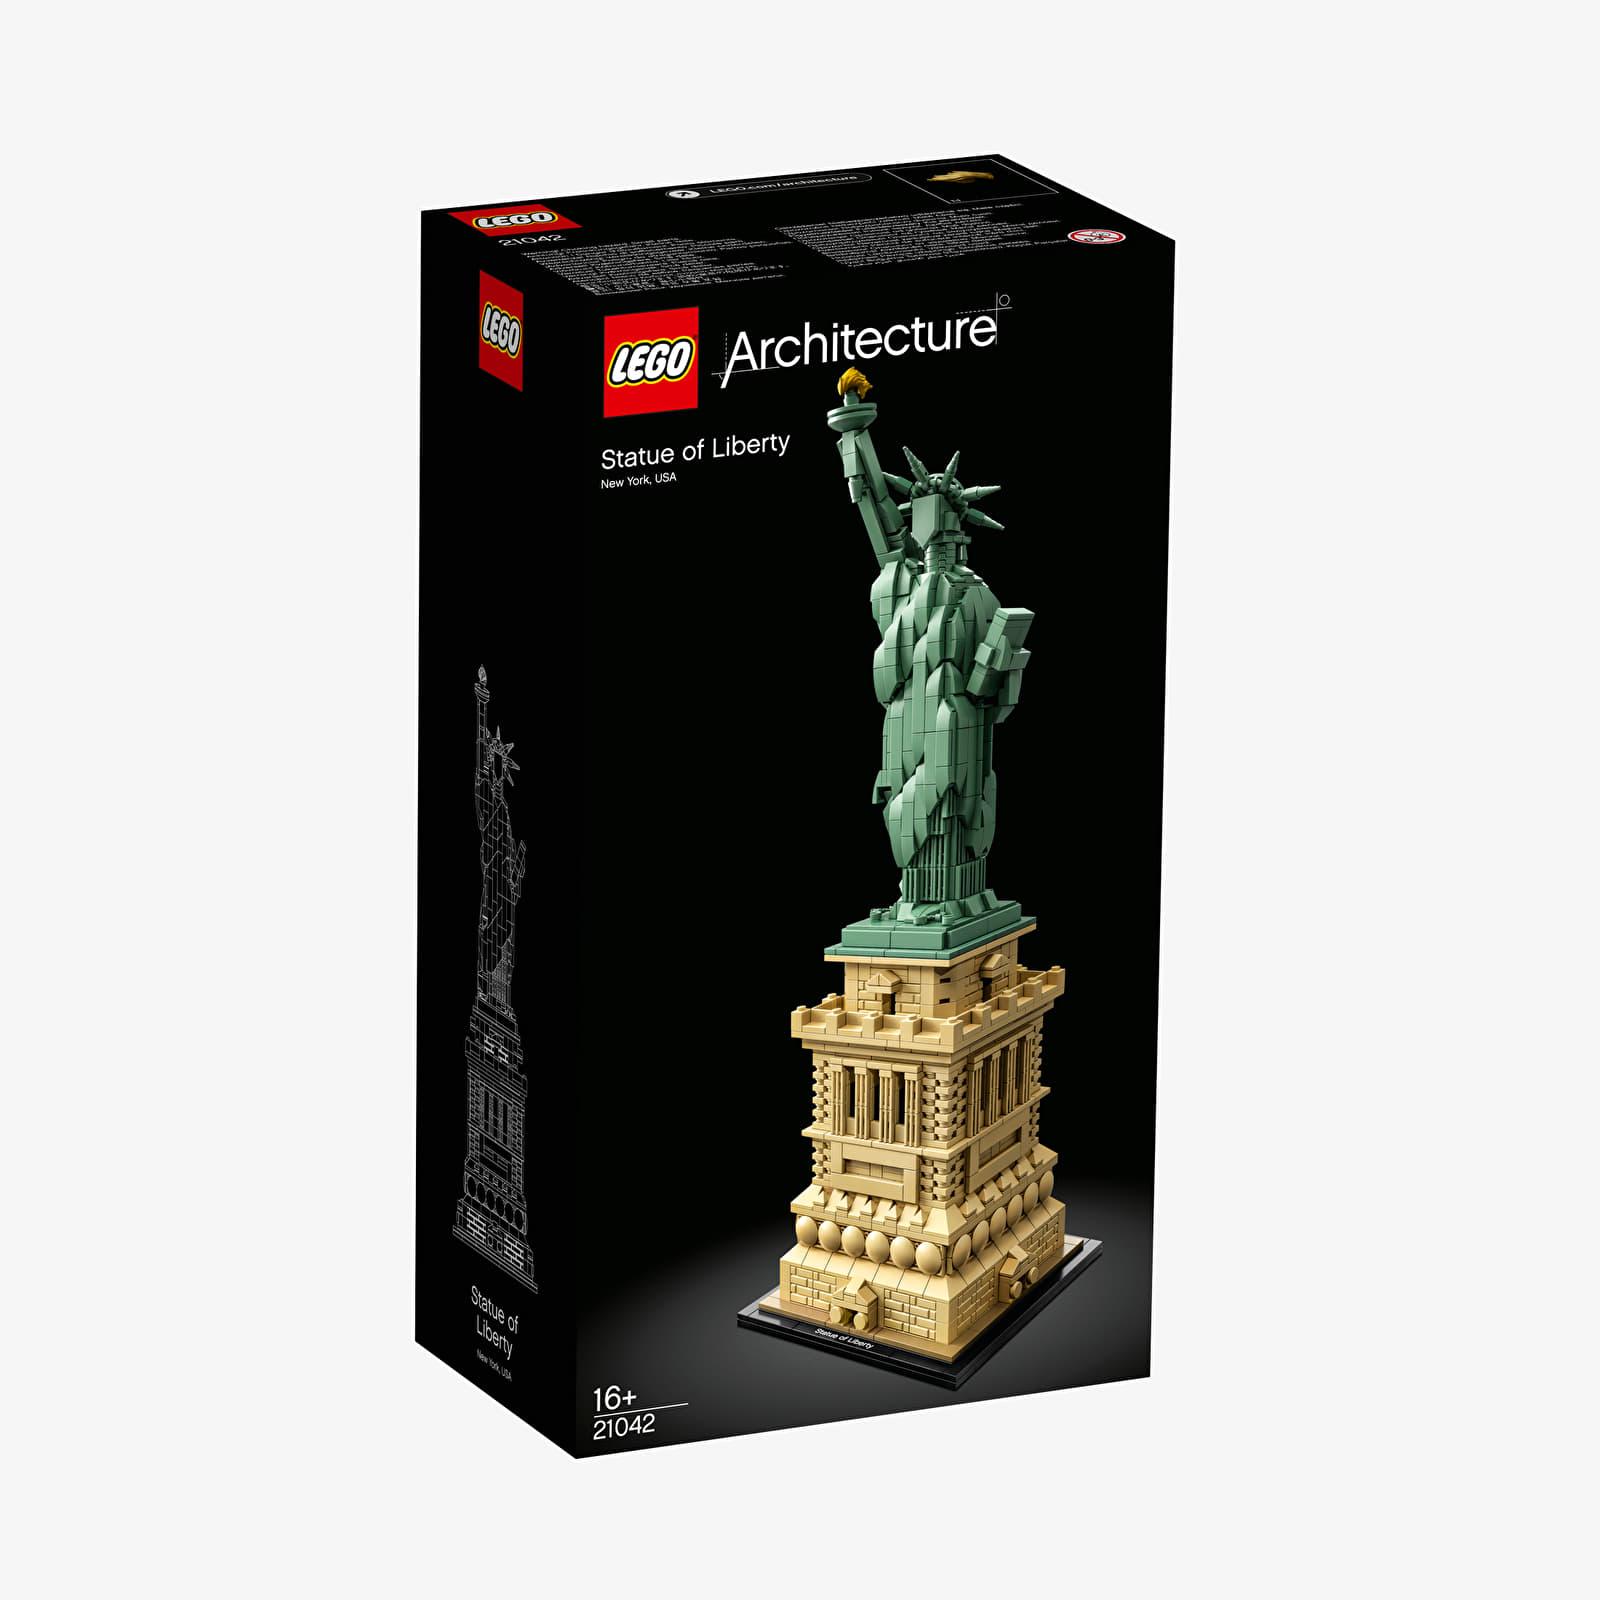 Kits de LEGO LEGO Architecture Statue of Liberty